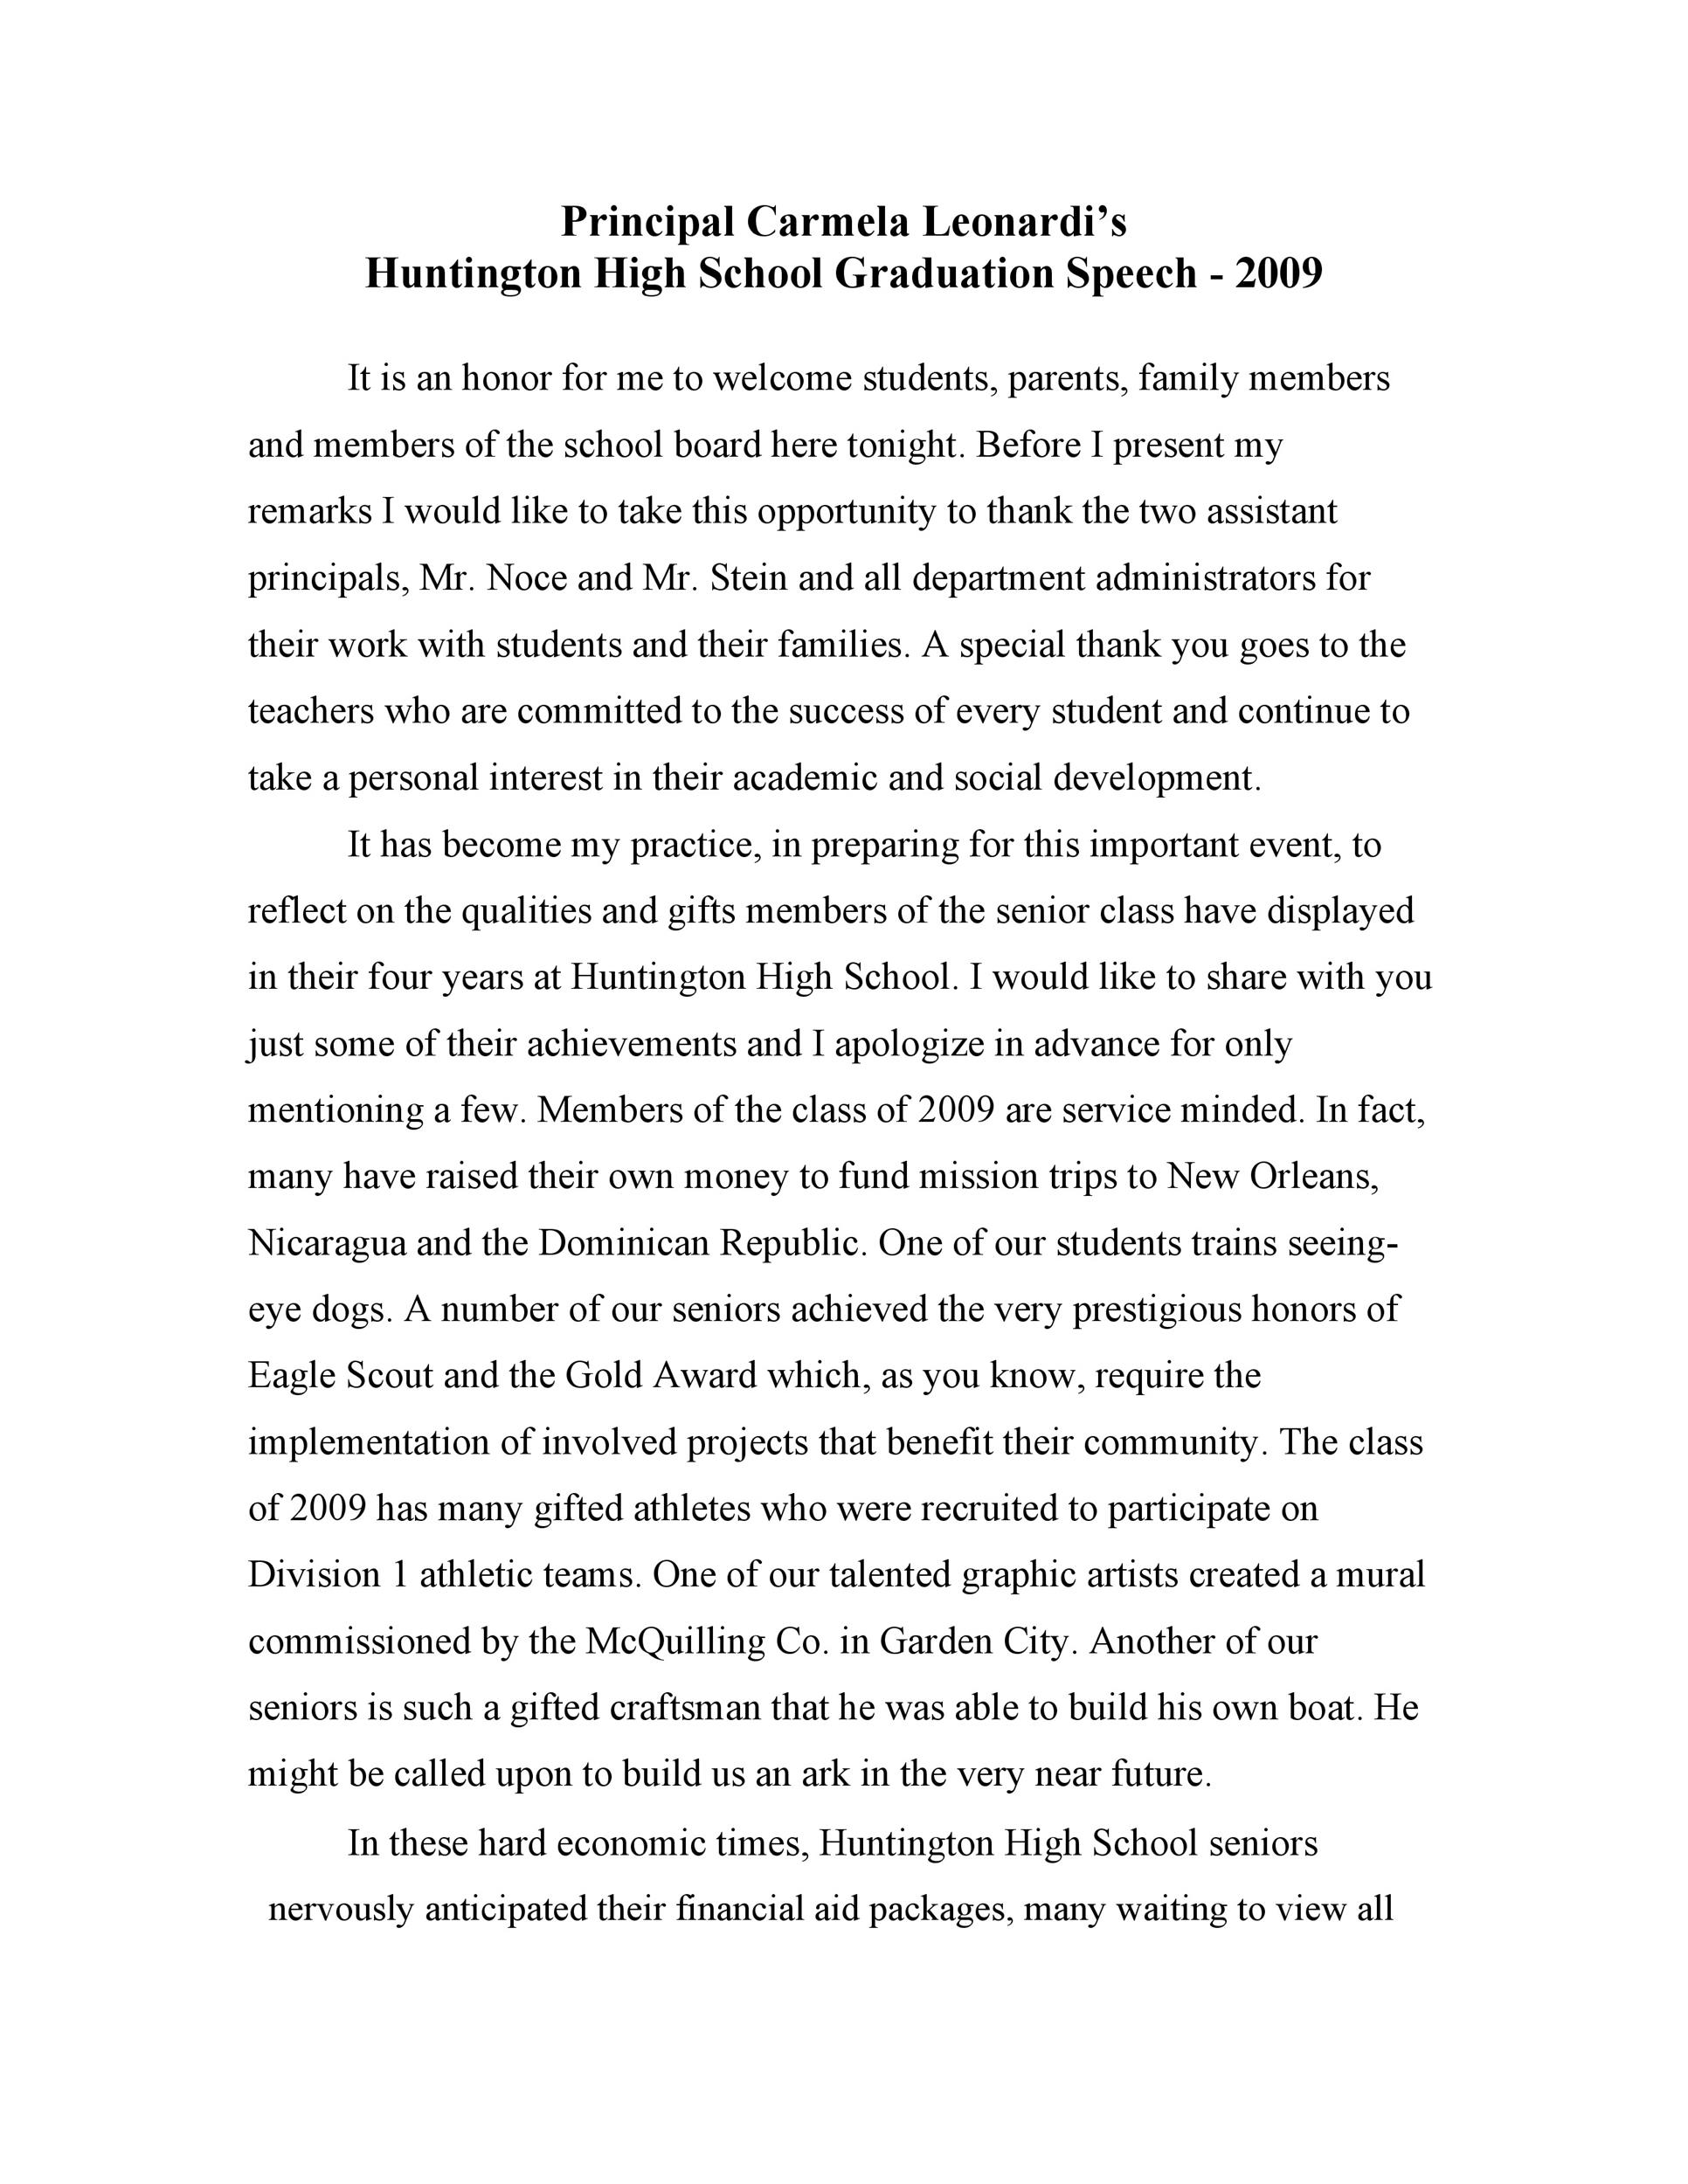 Free graduation speech example 15